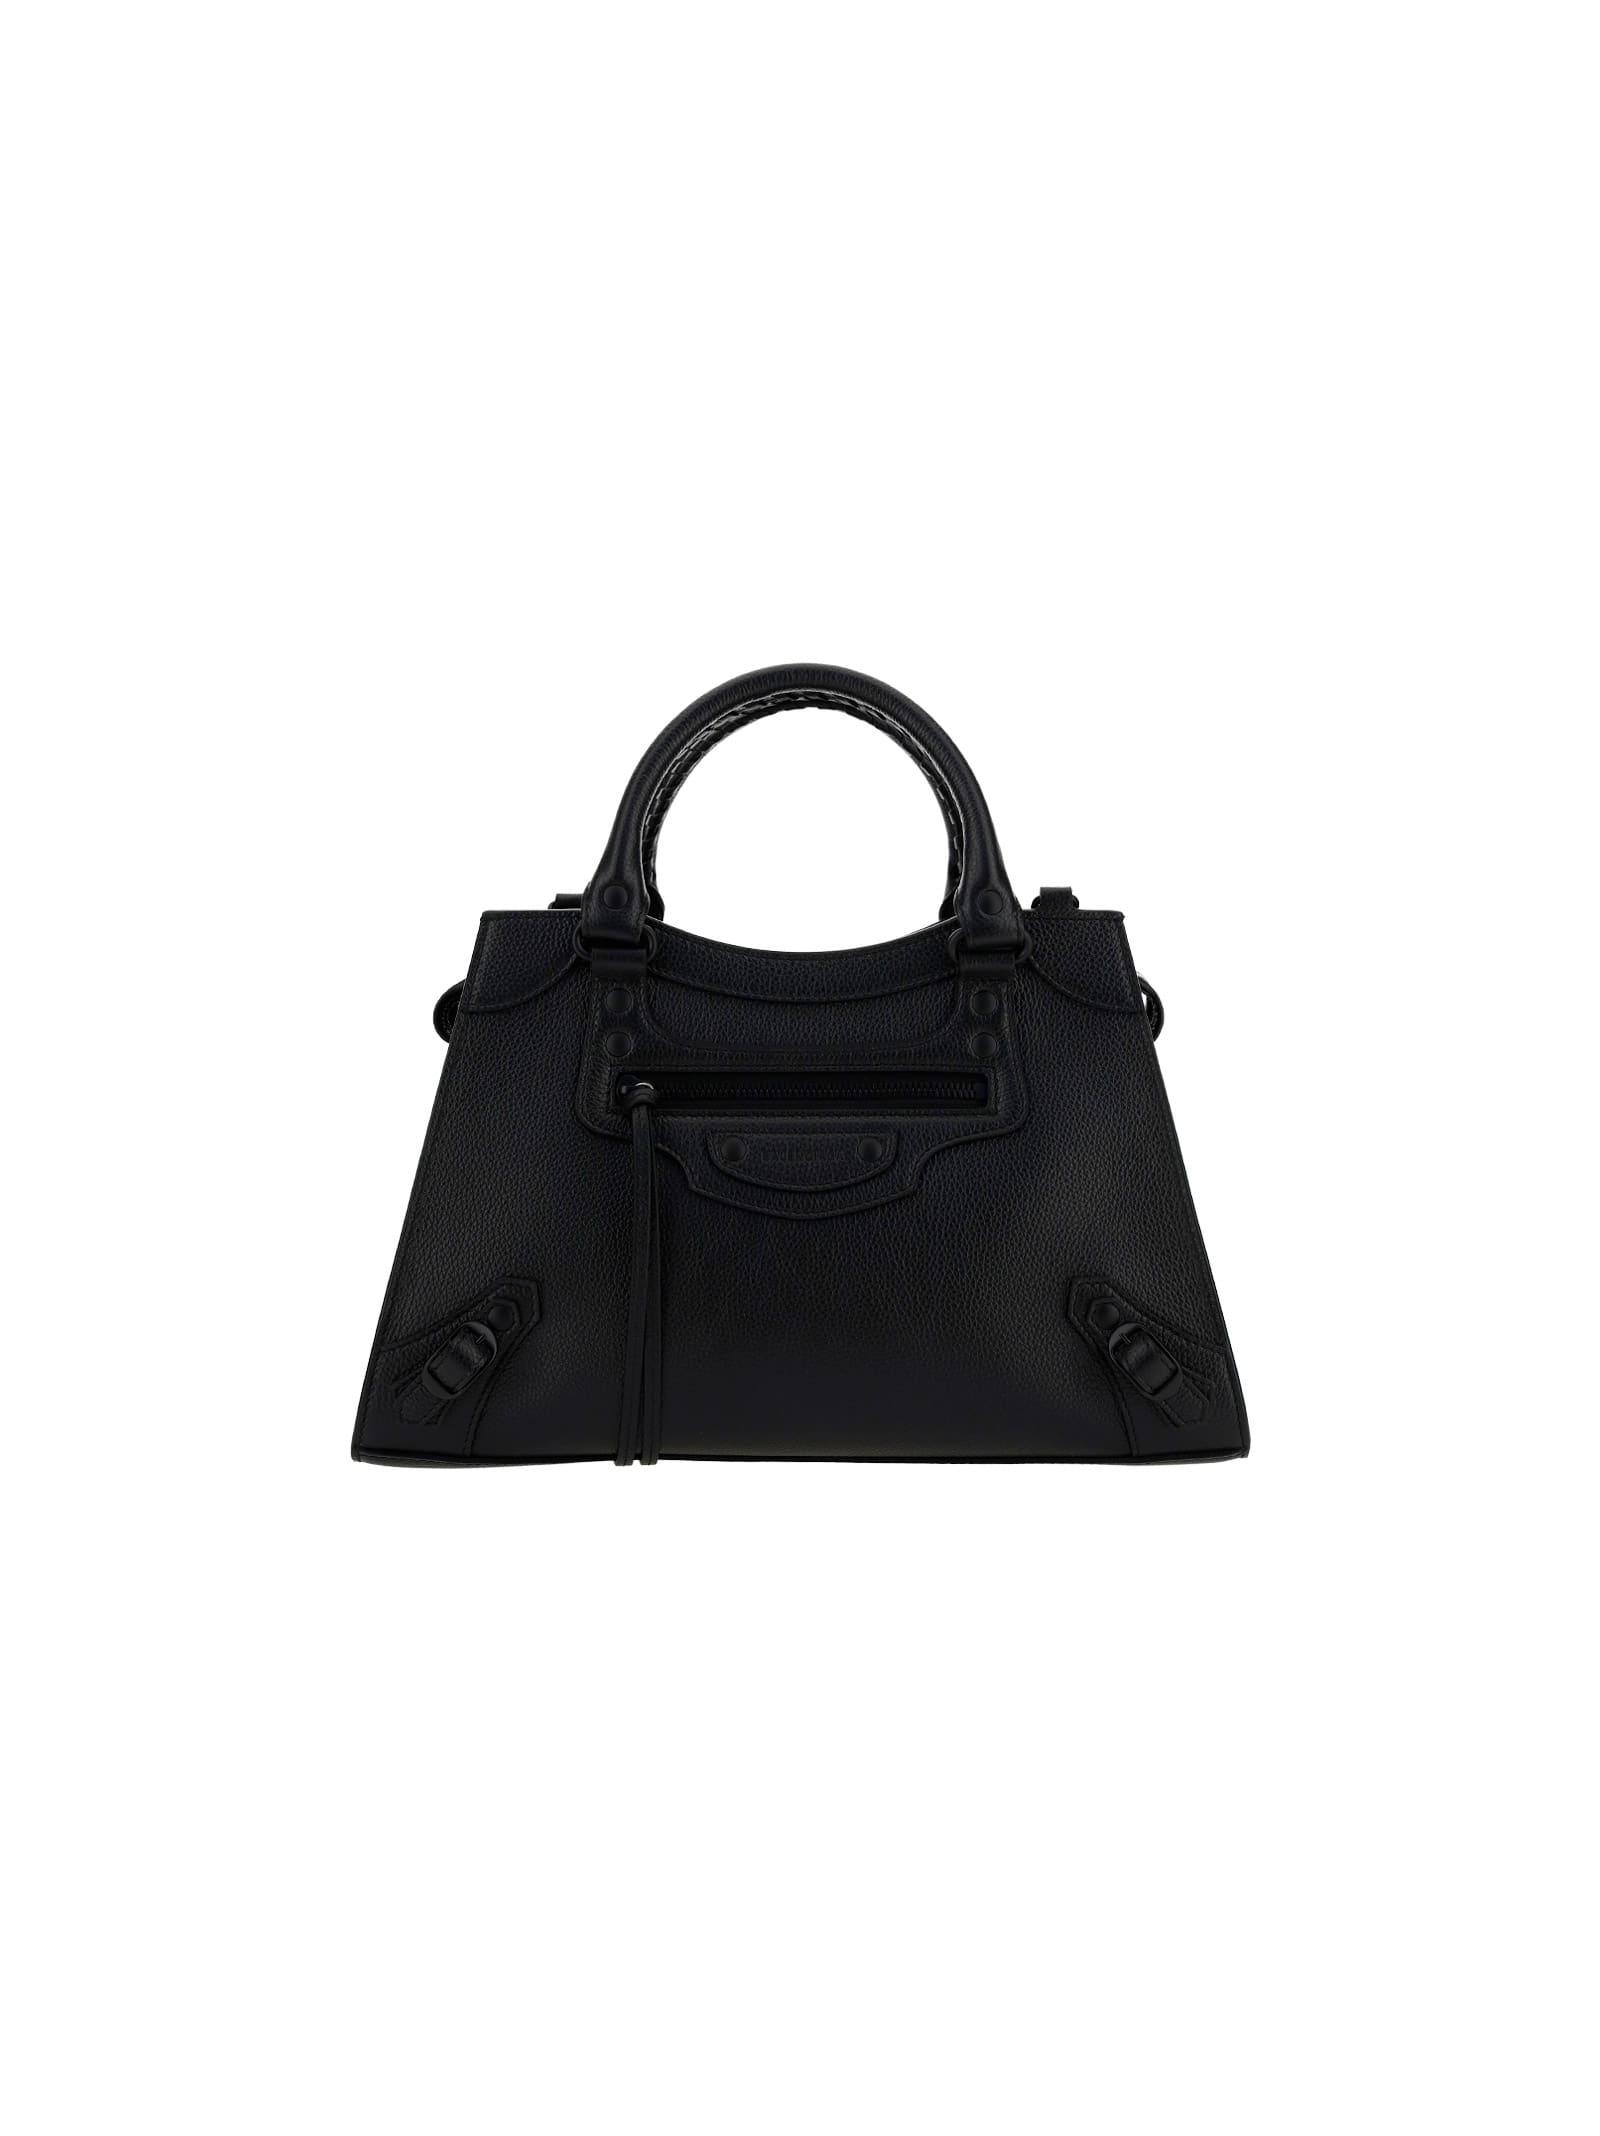 Balenciaga Leathers NEO CLASSIC CITY SMALL BAG